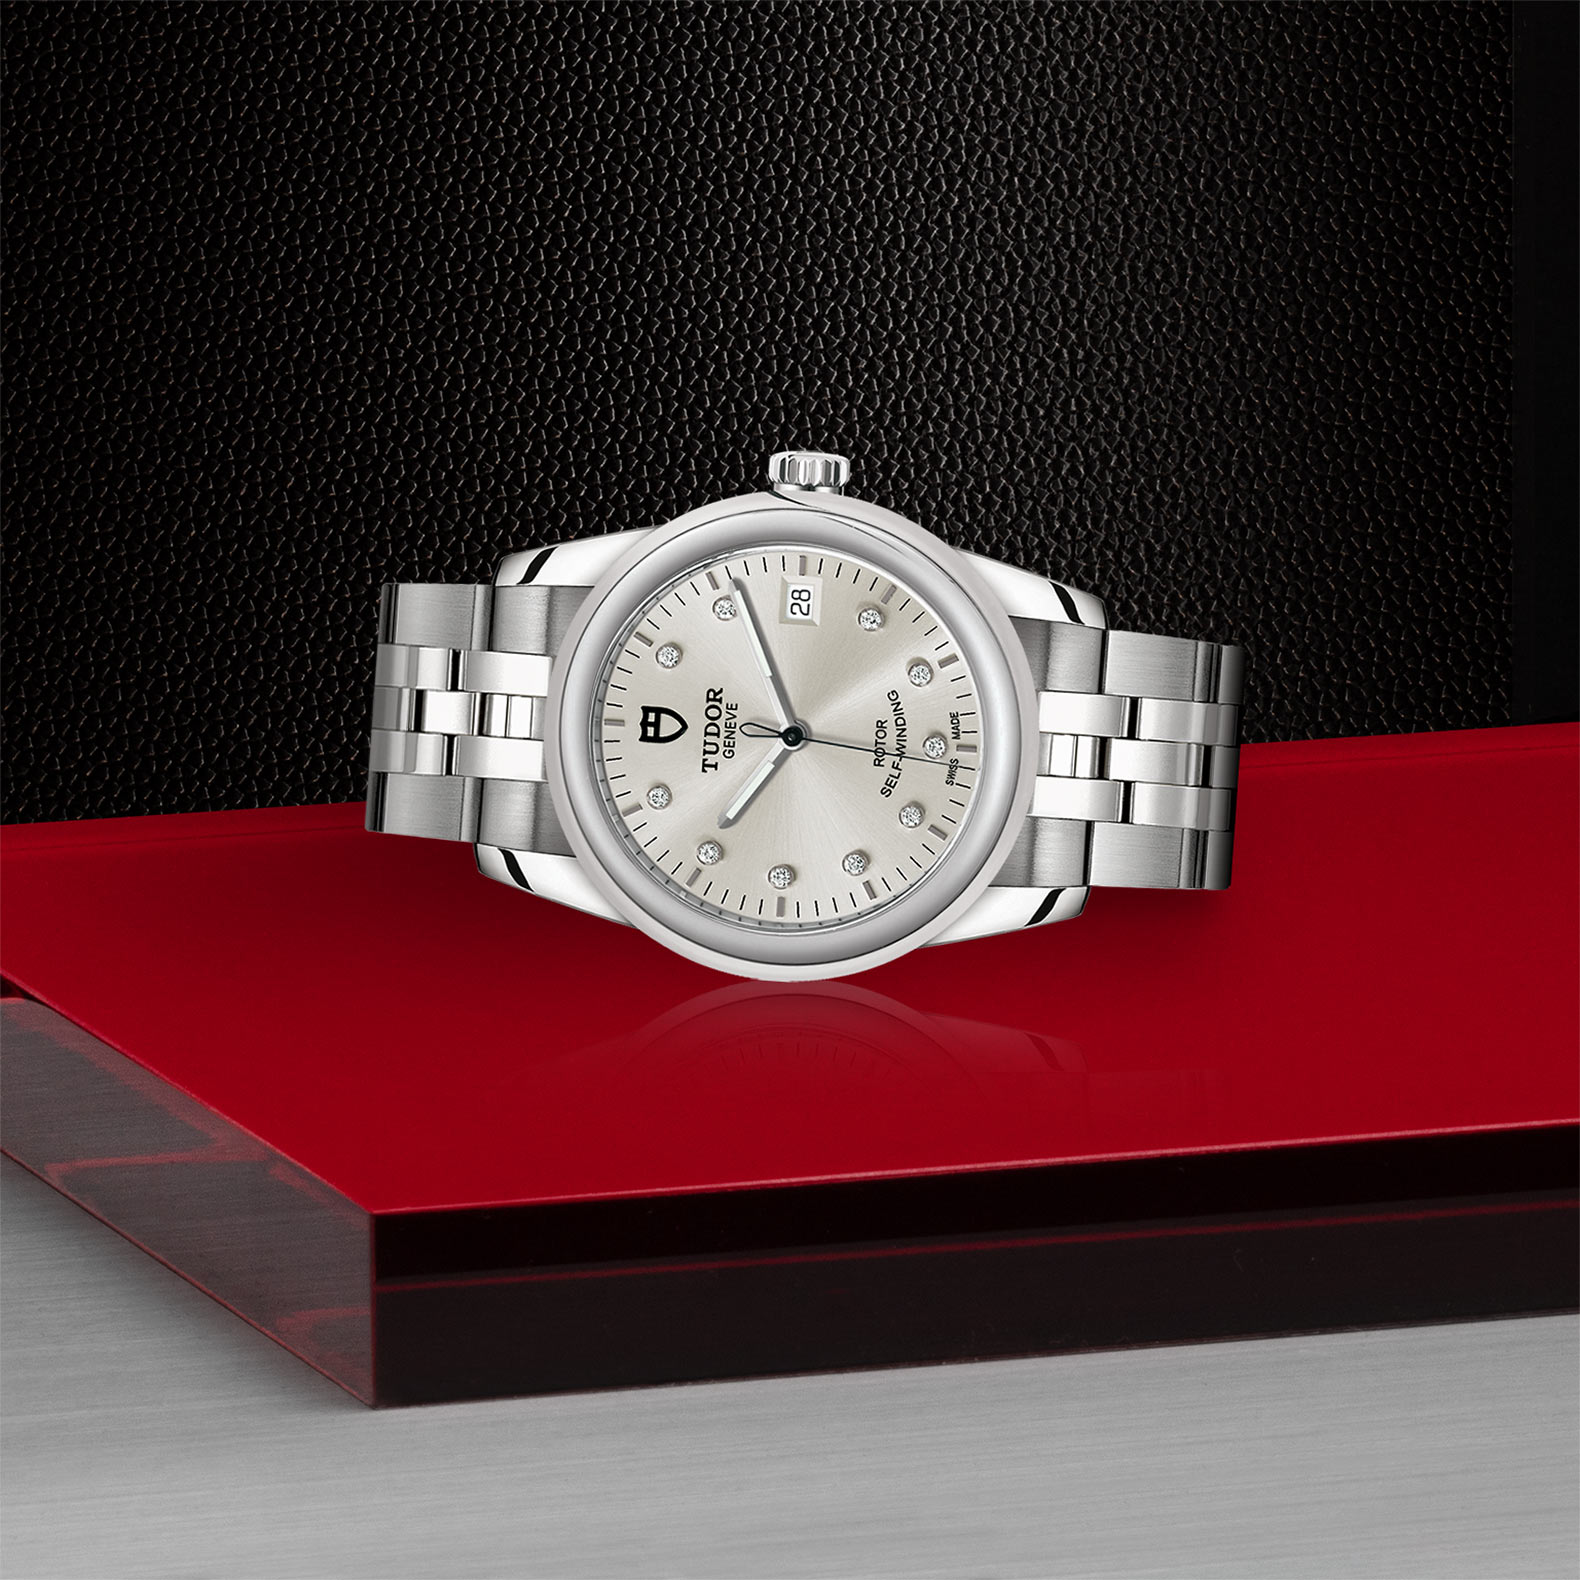 TUDOR Glamour Date - M55000-0006